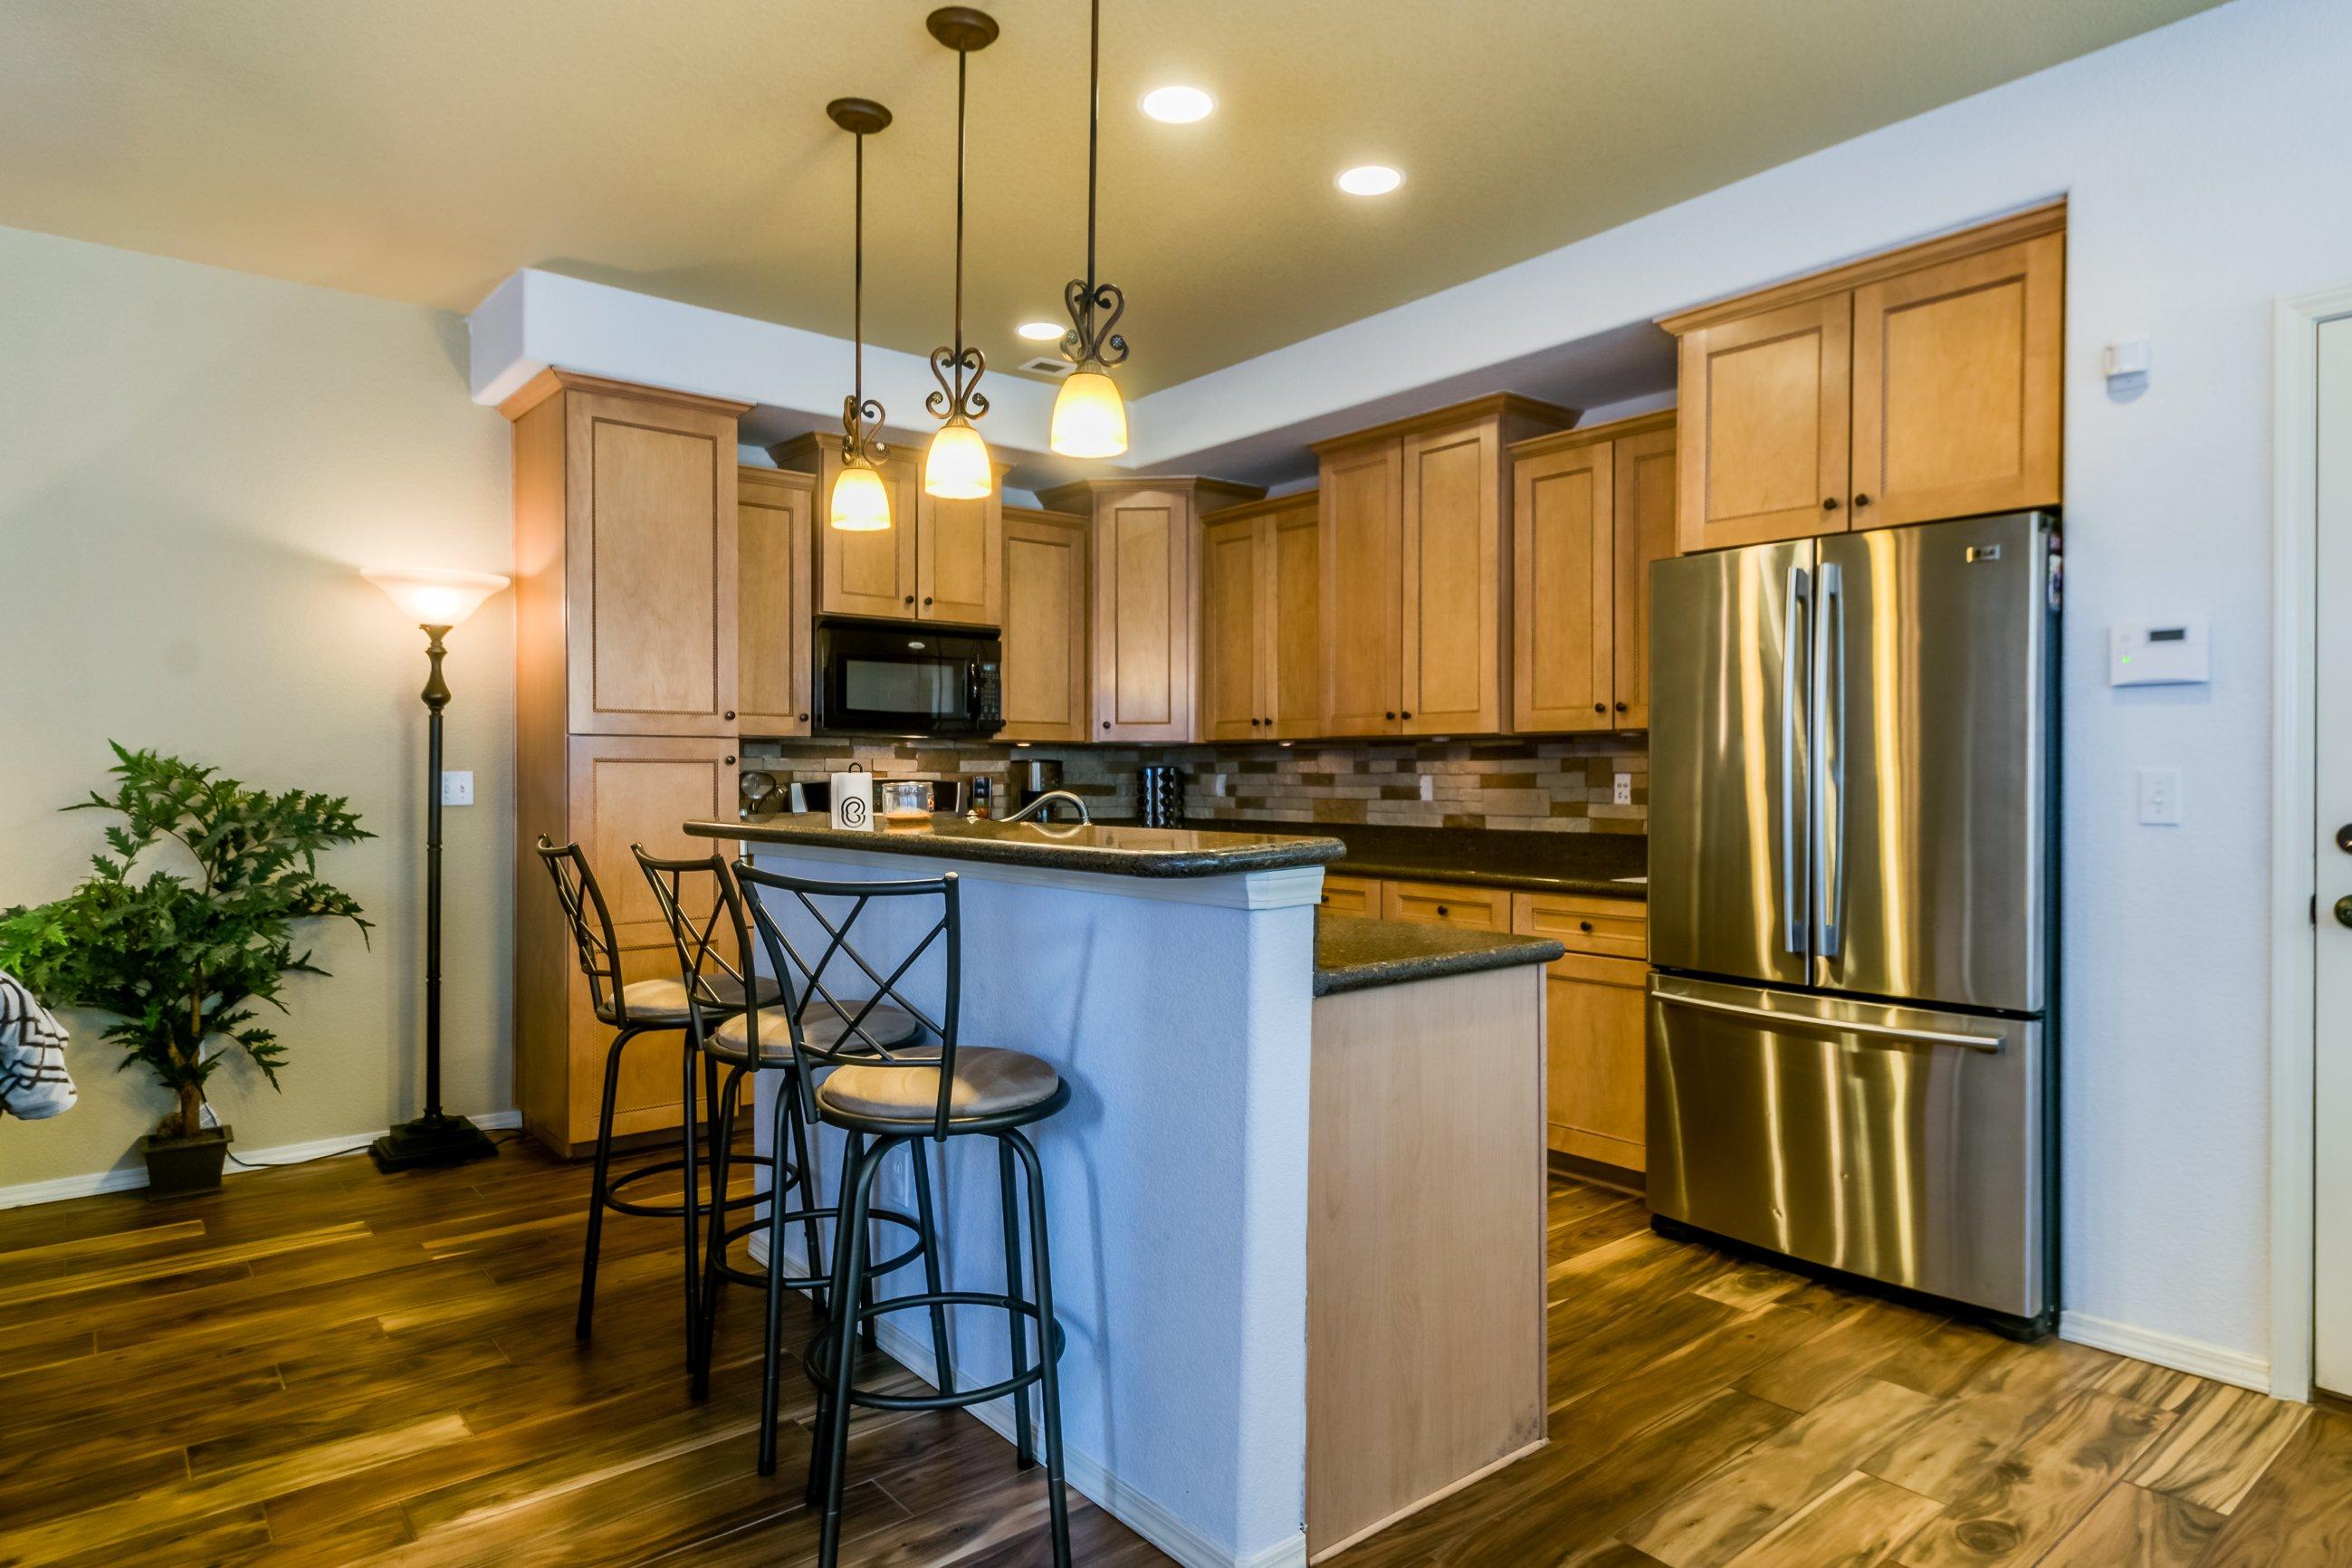 Gold Hill Mesa Gold Hill Mesa condo for sale, picture of kitchen